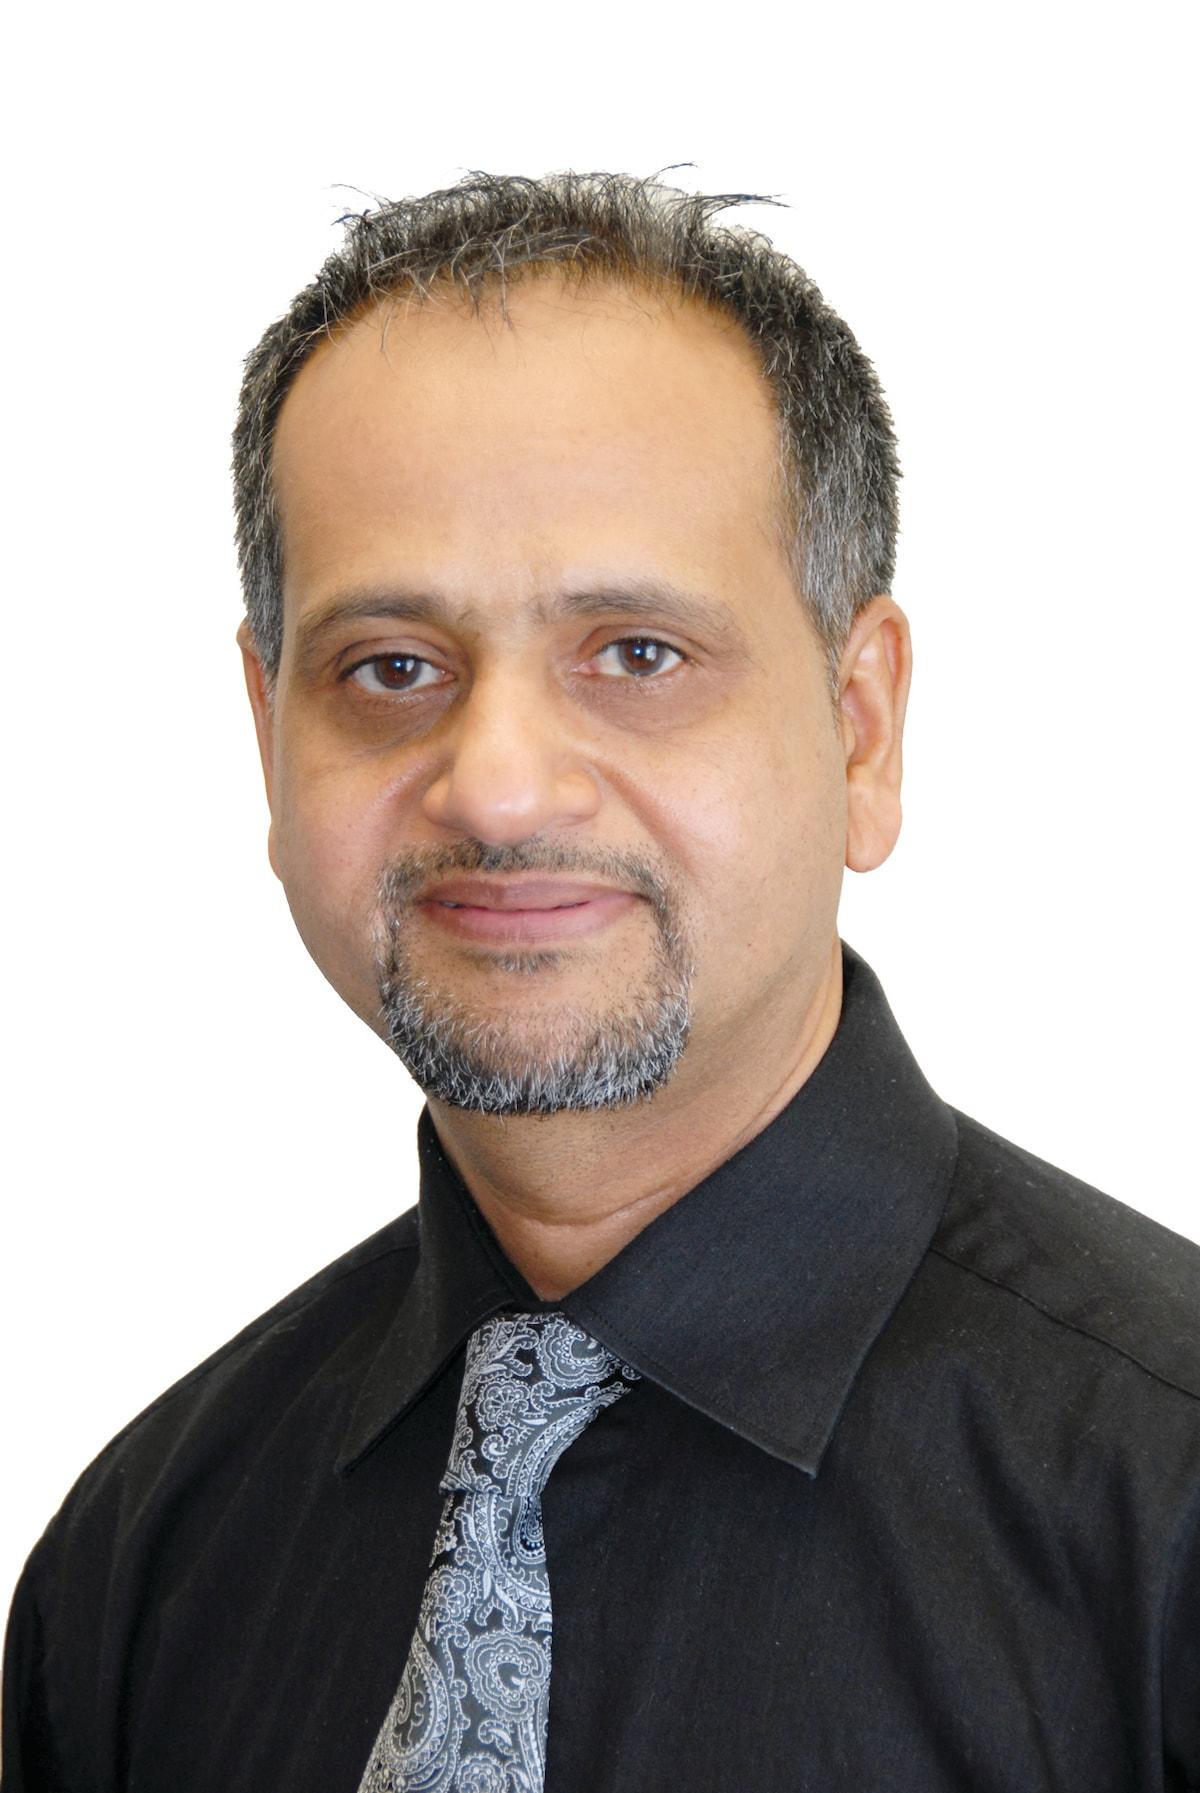 Muhammad From Niagara Falls, Canada